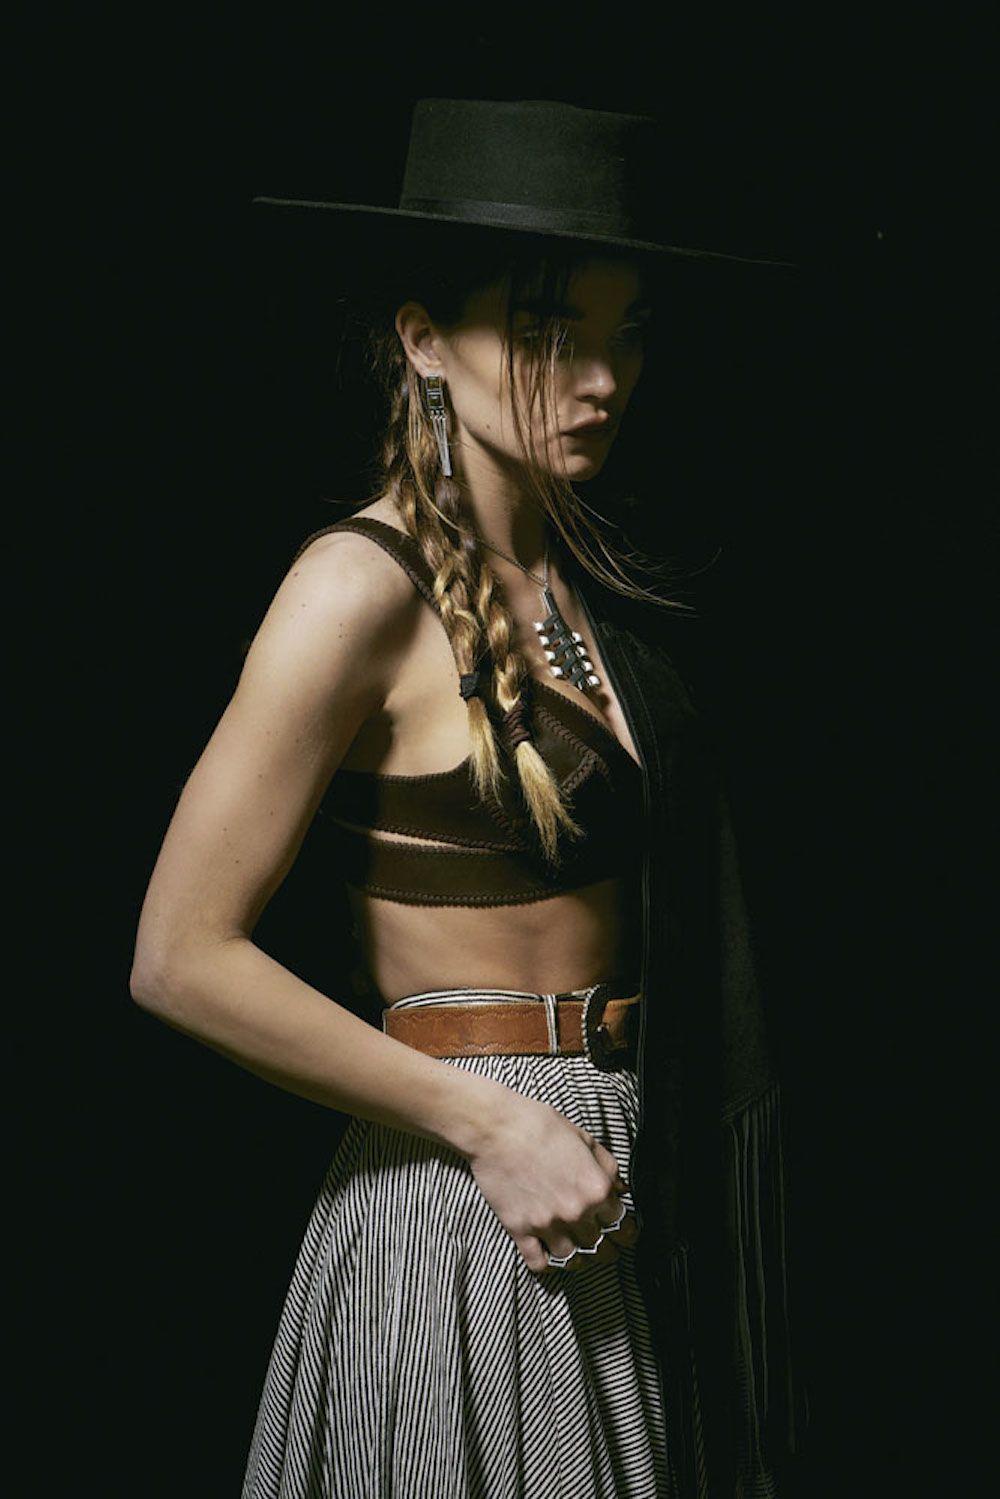 Western Romance | The 2 Bandits #the2bandits Photography: Harper Smith, Stylist: Coryn Madley, H & M: Ramsell & Kali Kennedy, Model: Allie Crandell